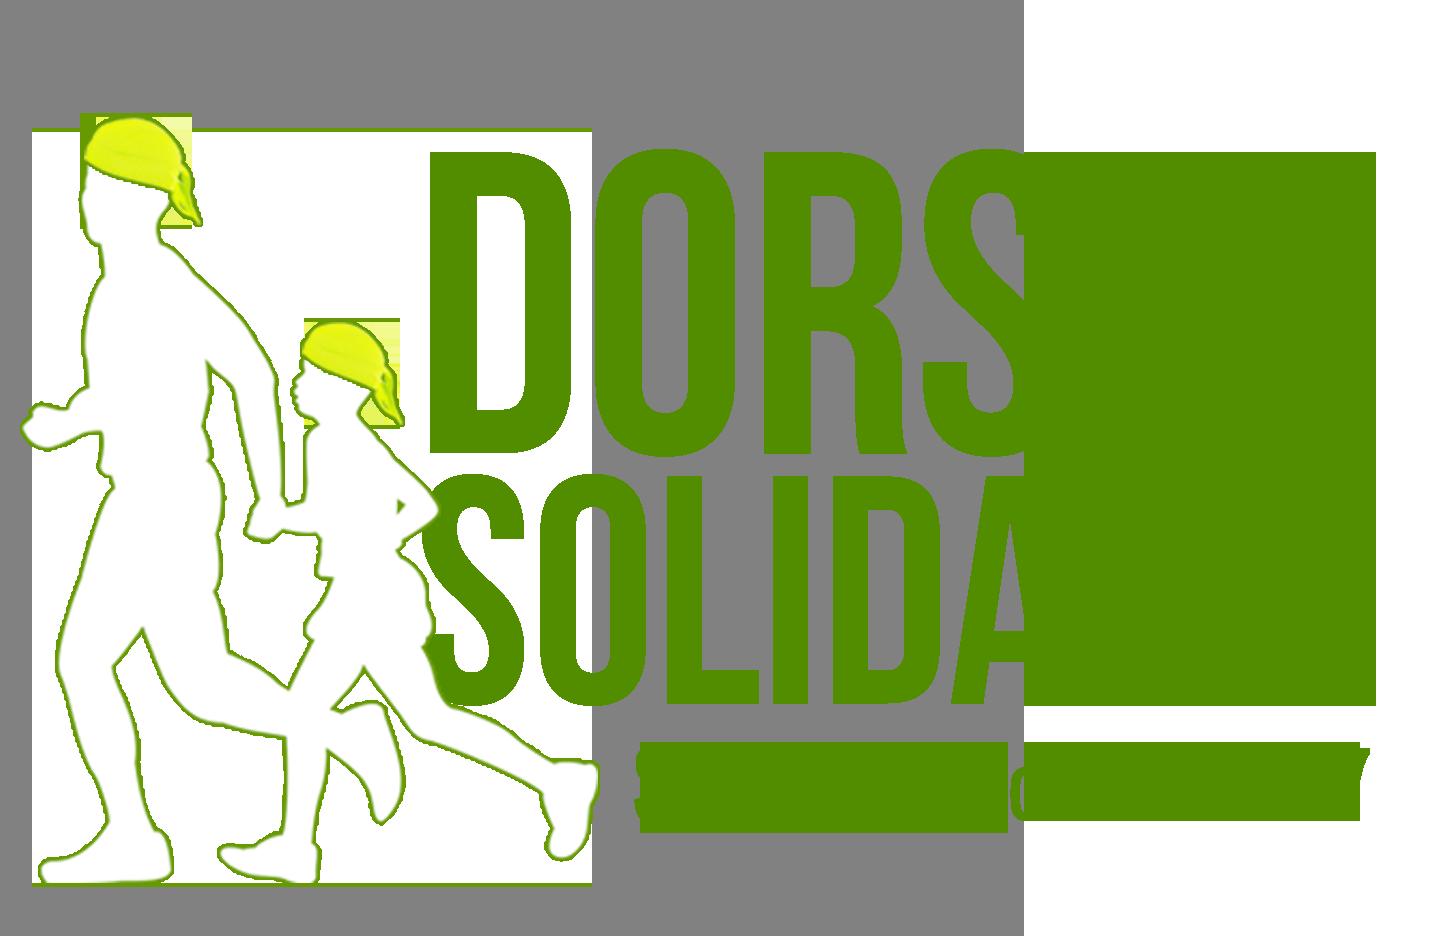 SEHOP-5carreraSolidaria-tuskilometrosnosdanvida-DORSAL0